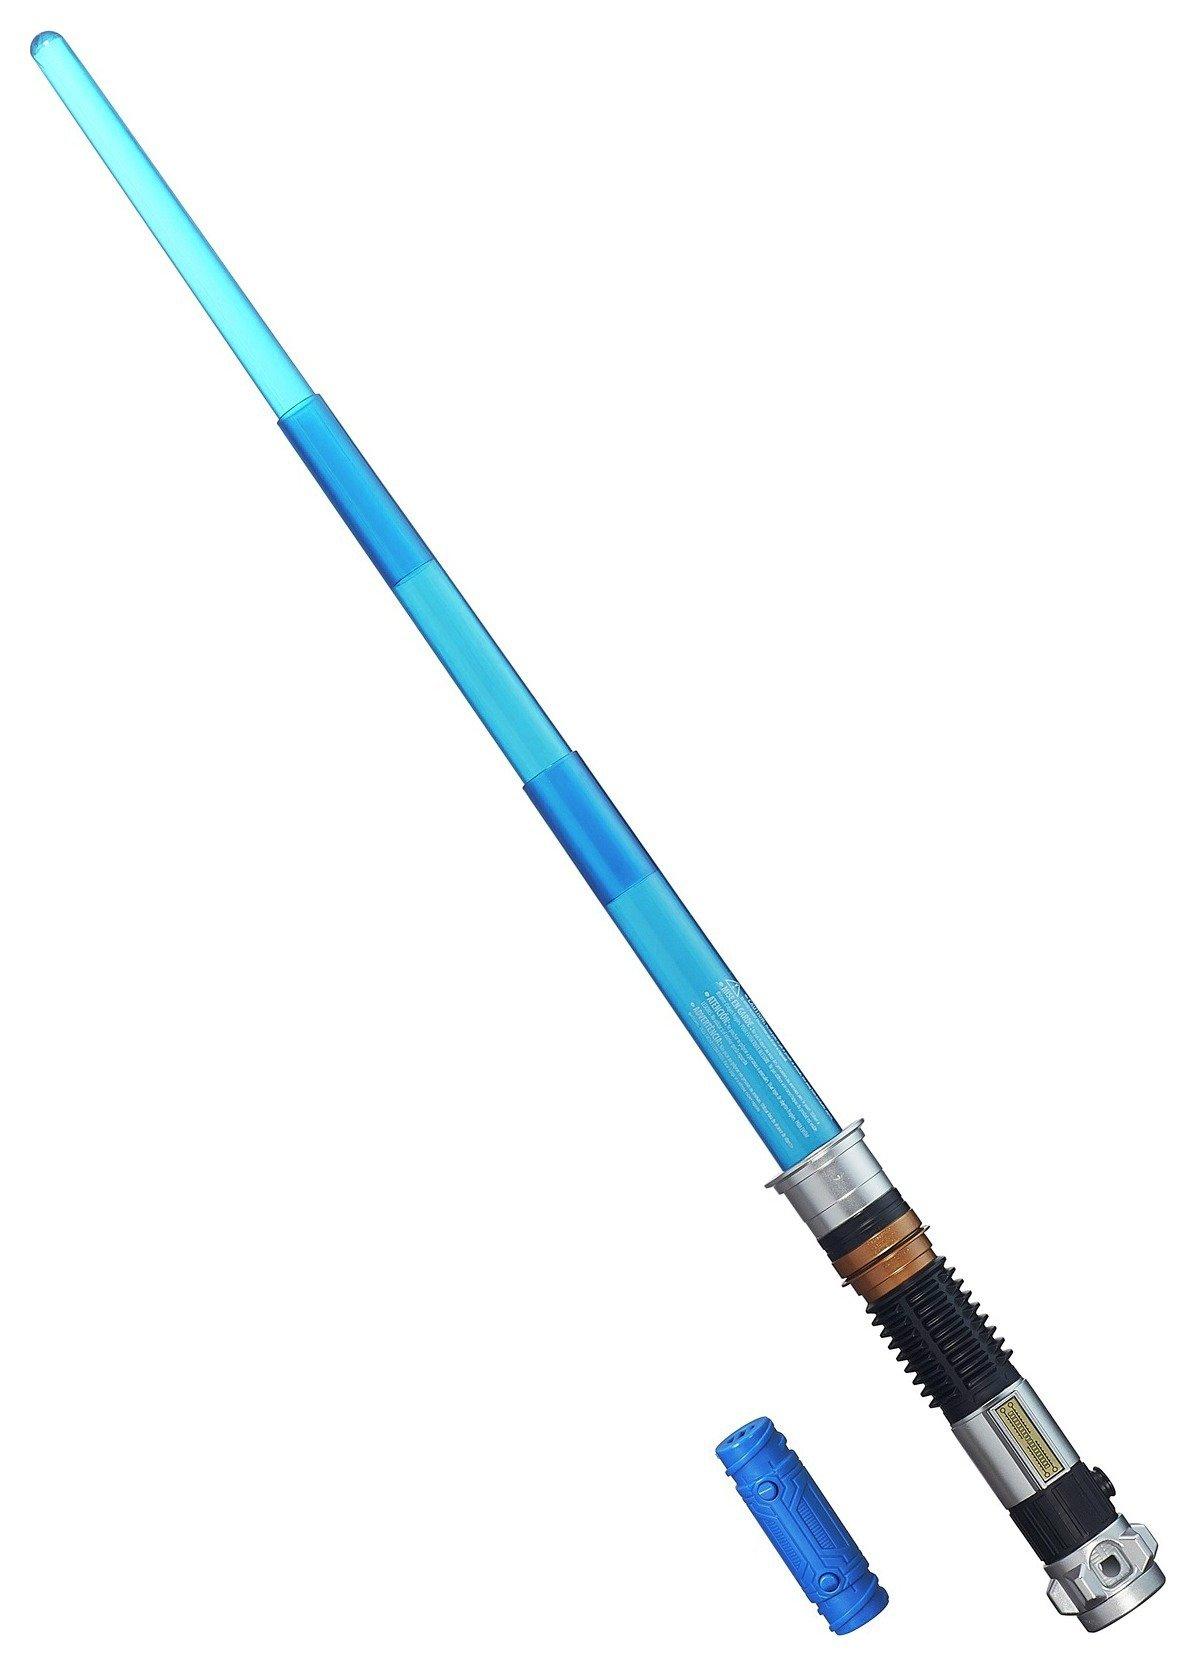 Star Wars Electronic Jedi/Sith Lightsaber Assortment